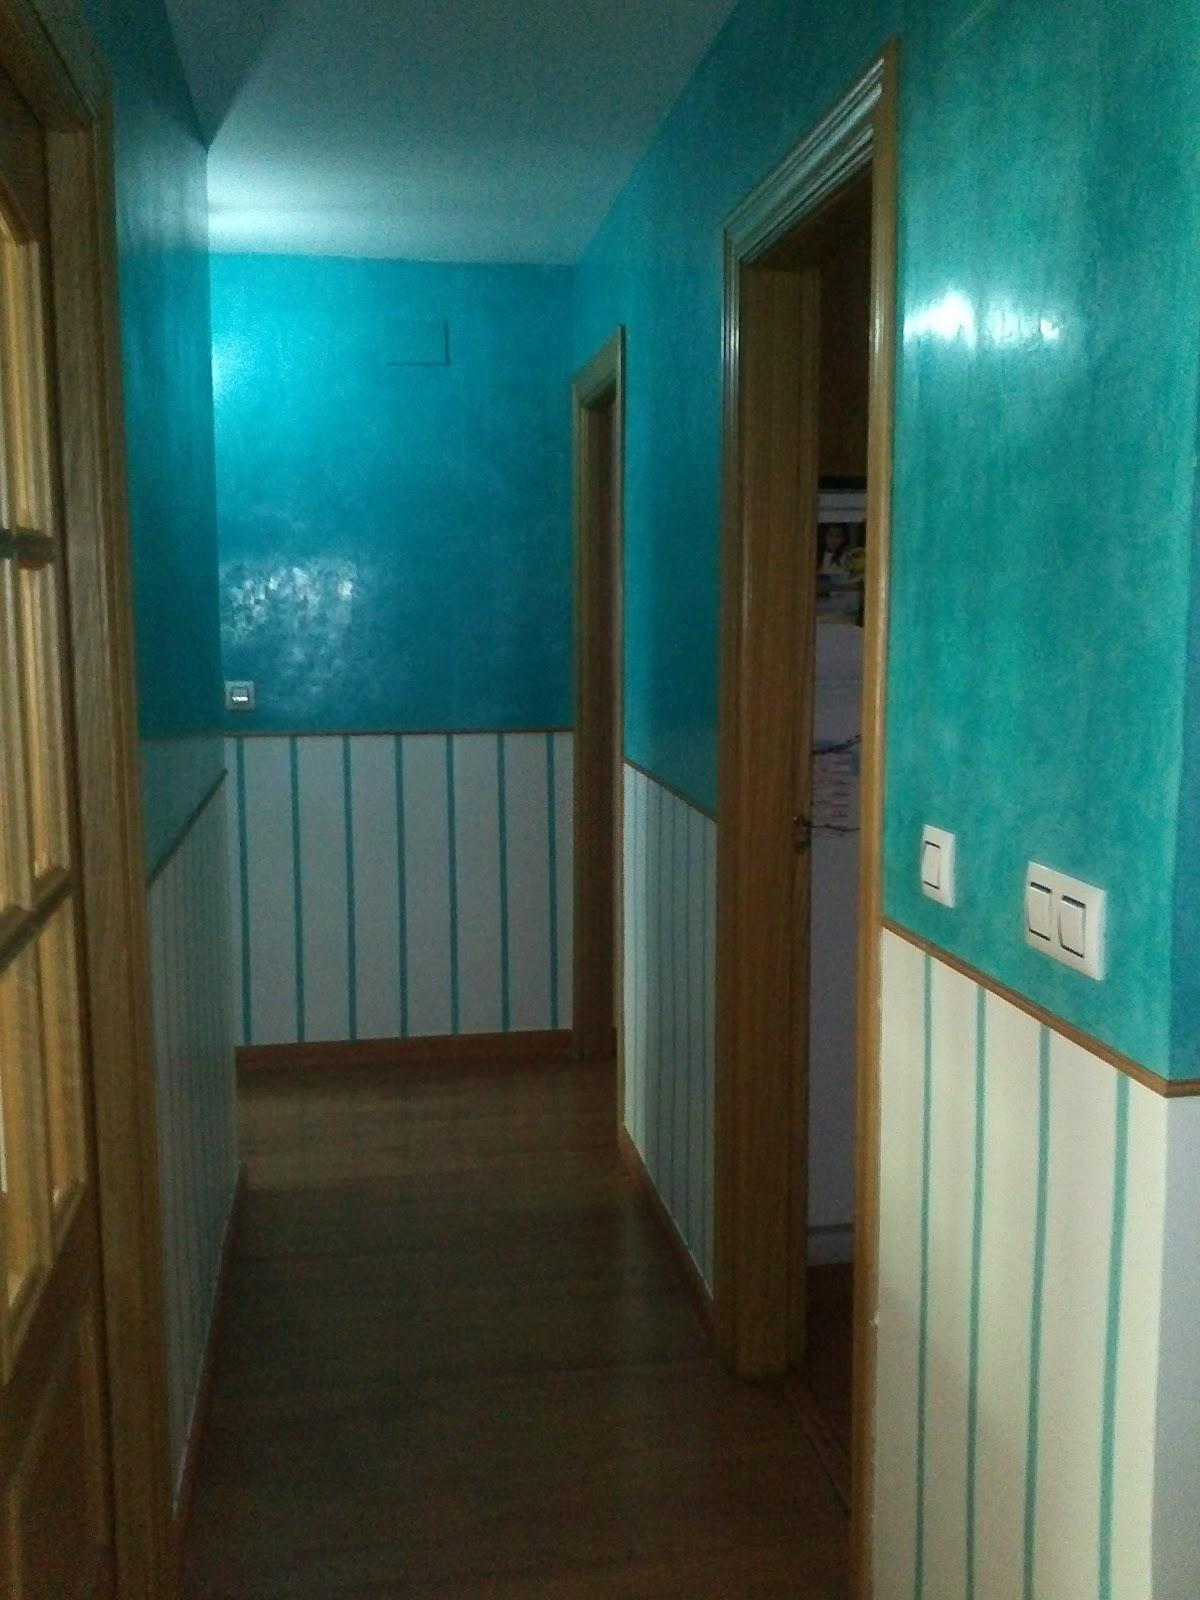 Pasillos pintados a rayas beautiful pasillo colores with - Pasillos pintados a rayas ...